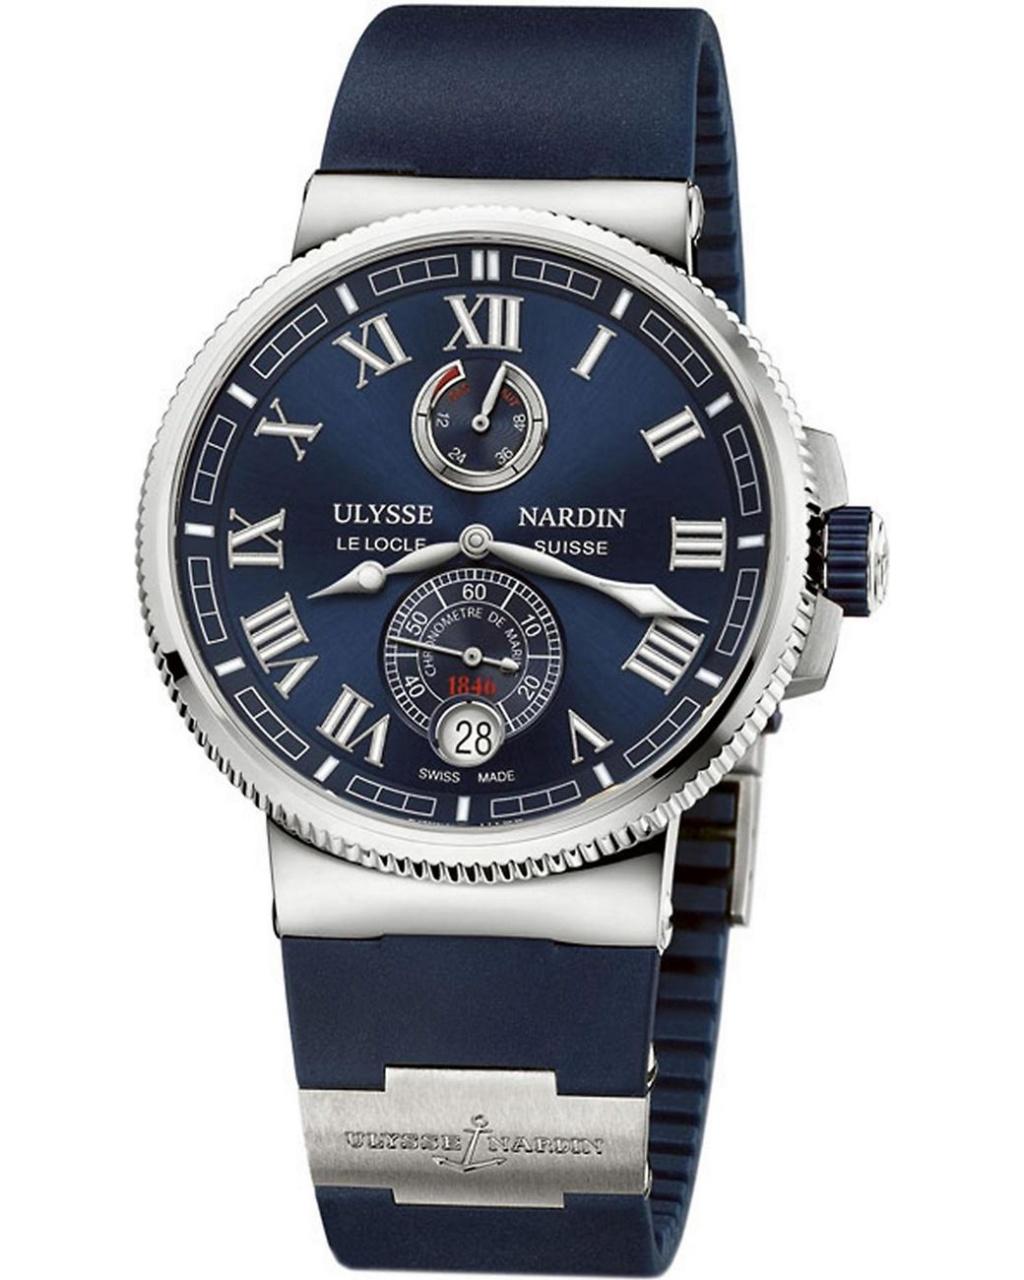 Швейцарские nardin ulysse продам часы продам часы бу